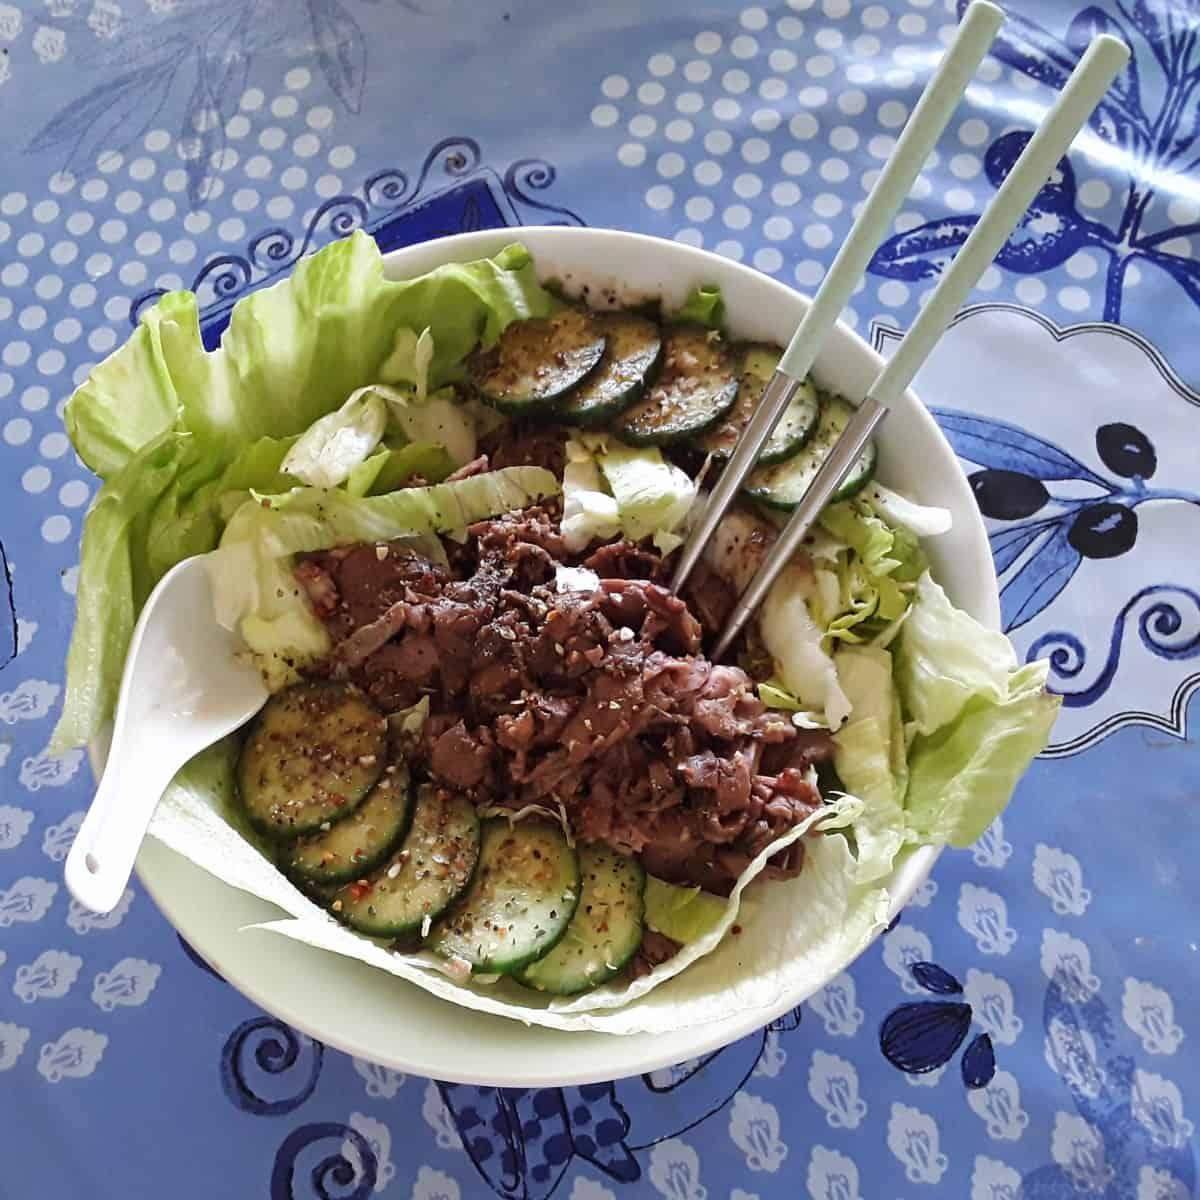 Thai beef salad in white bowl with chopsticks.